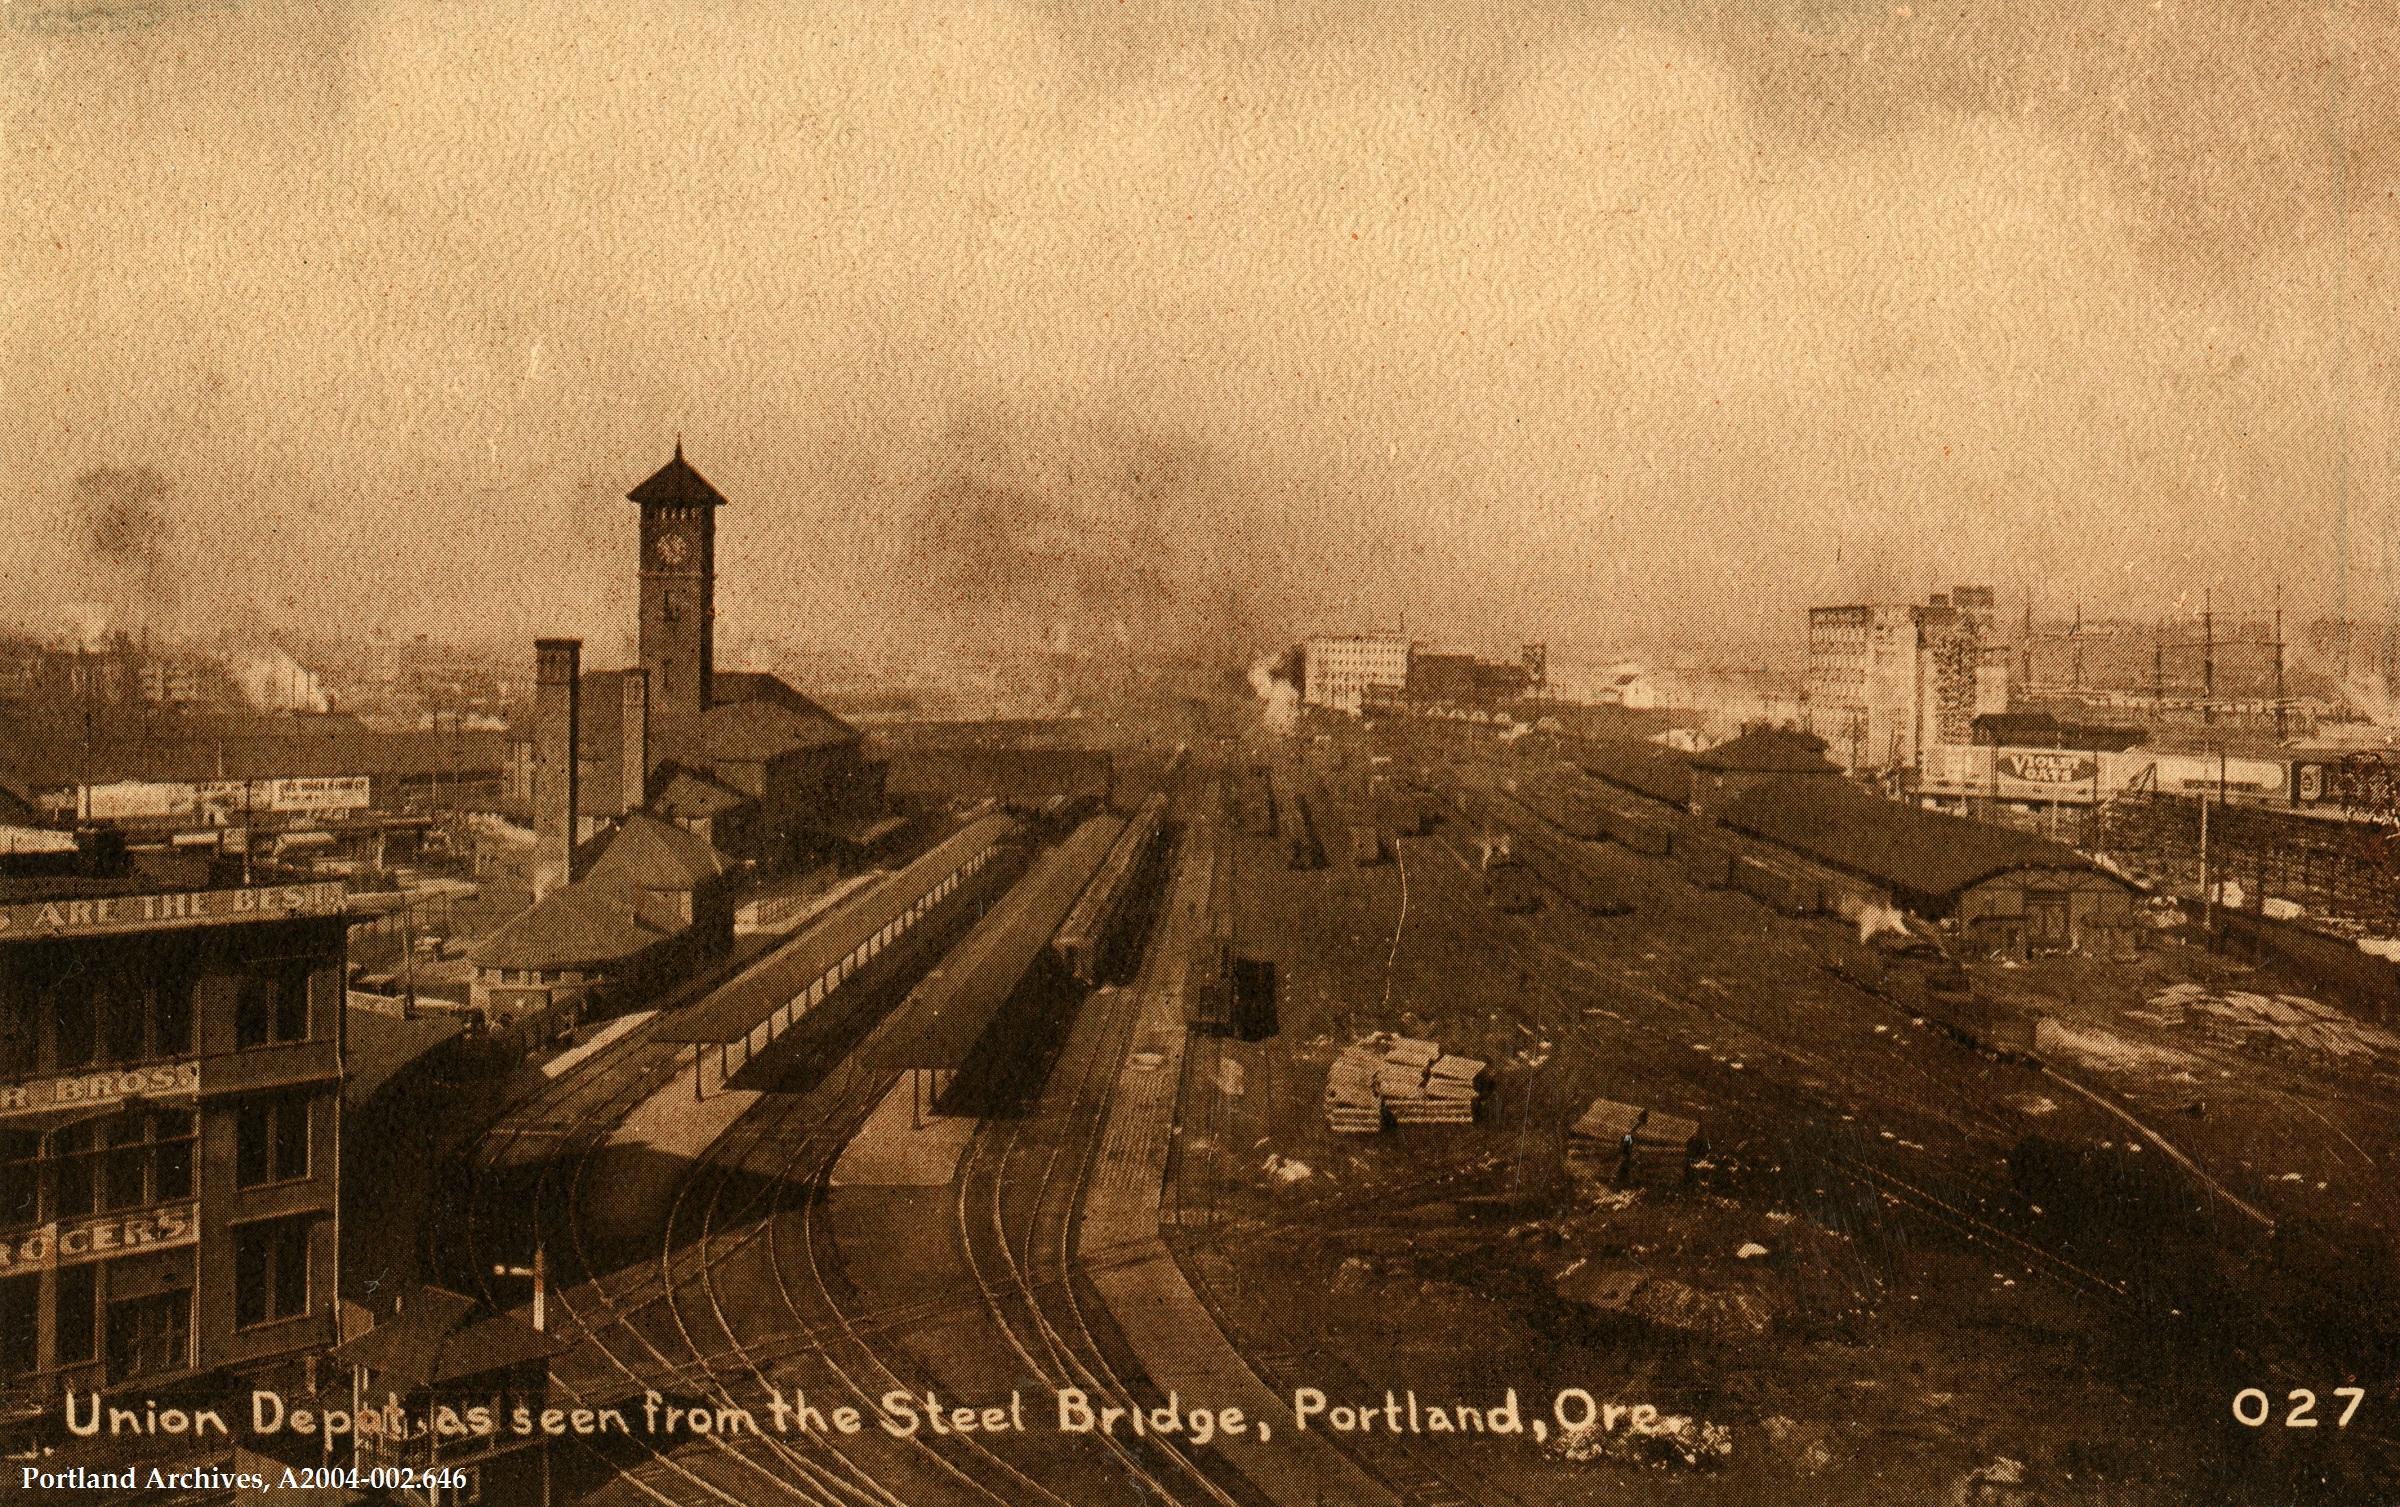 City of Portland Archives, Oregon, A2004-002.646